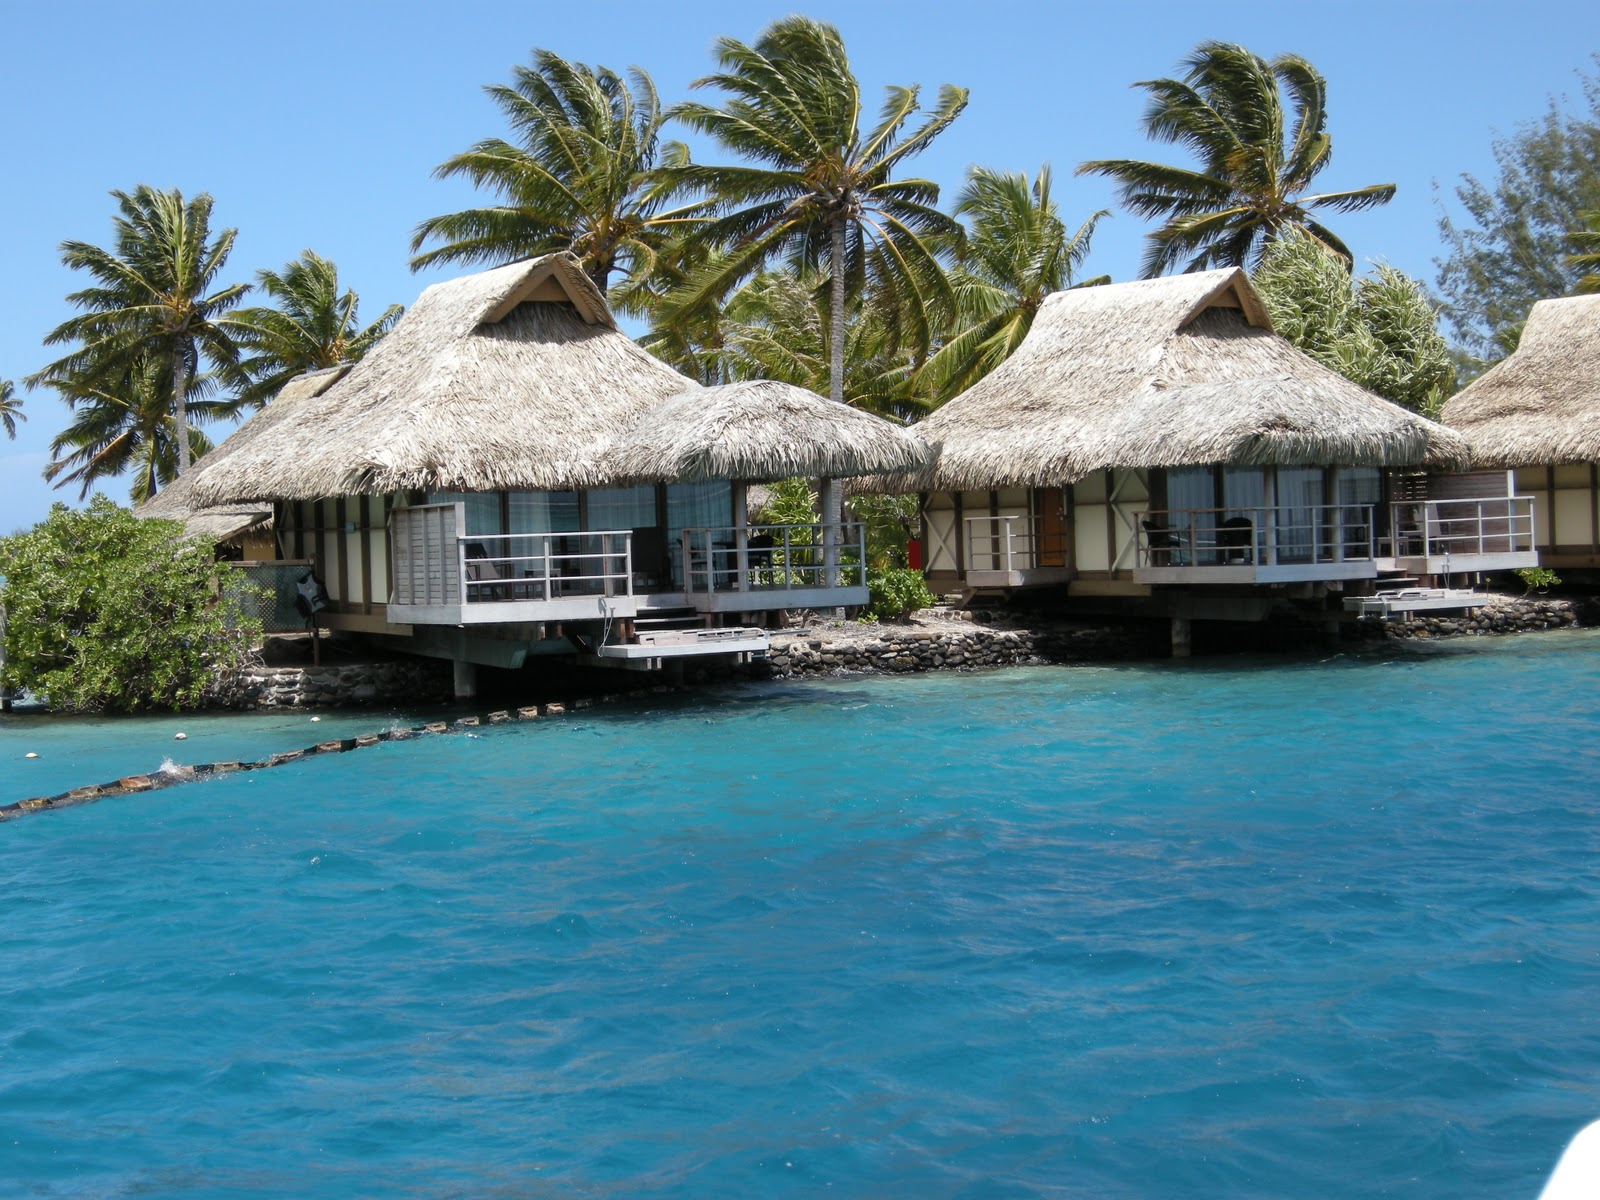 Tahiti Bathing Suits